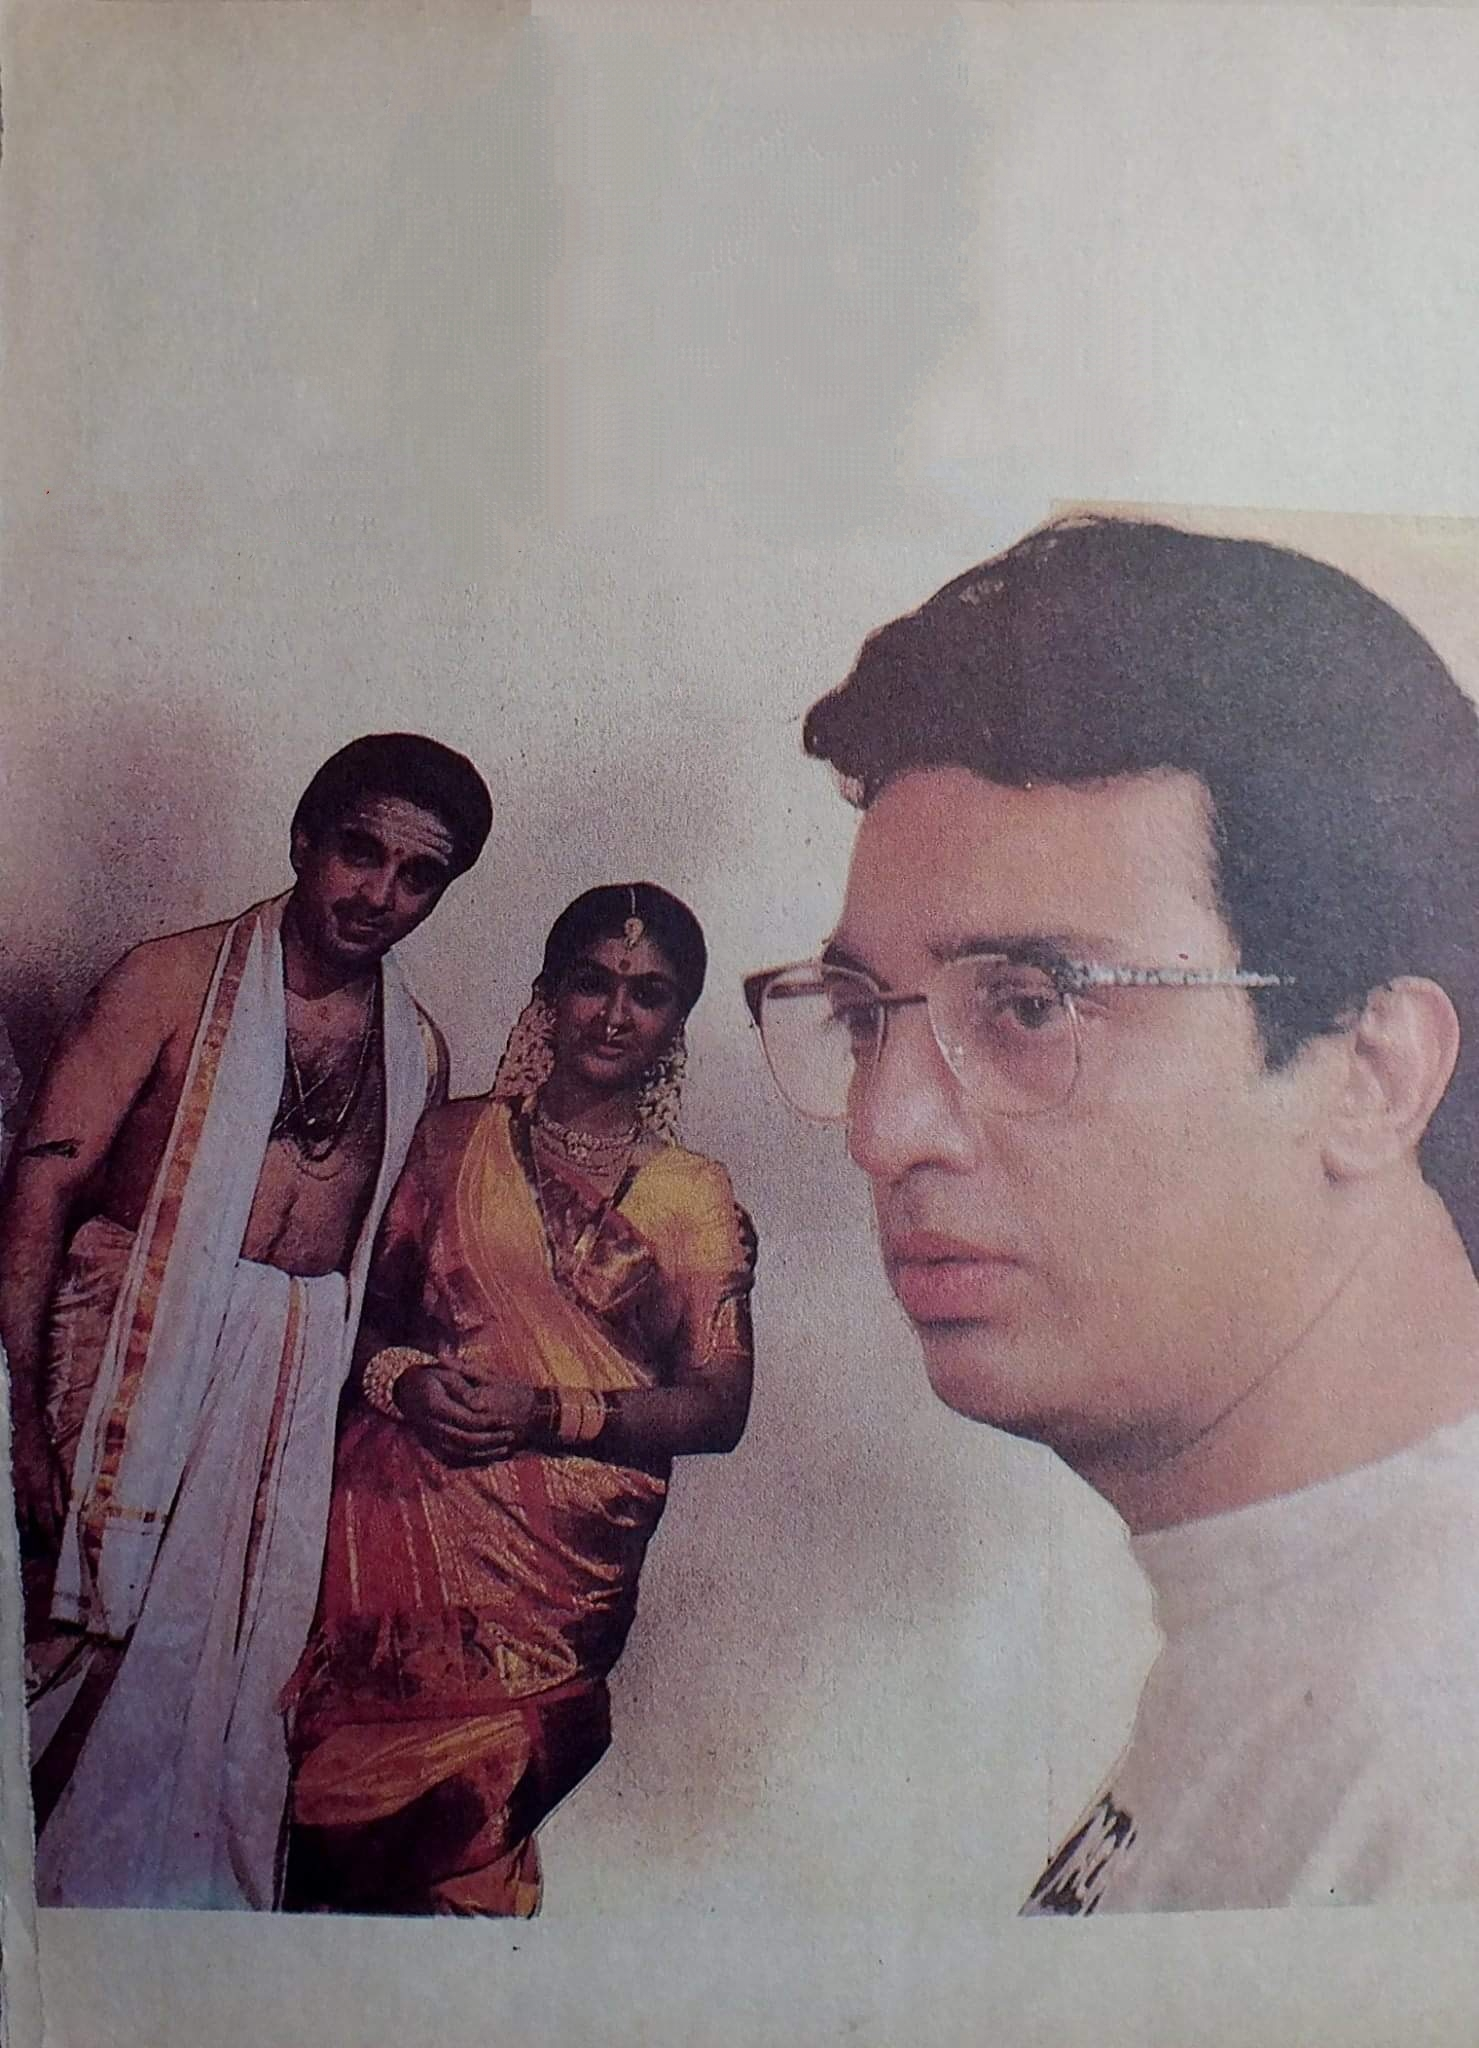 Kamal Haasan and Urvashi in Michael Madana Kama Rajan (1990)